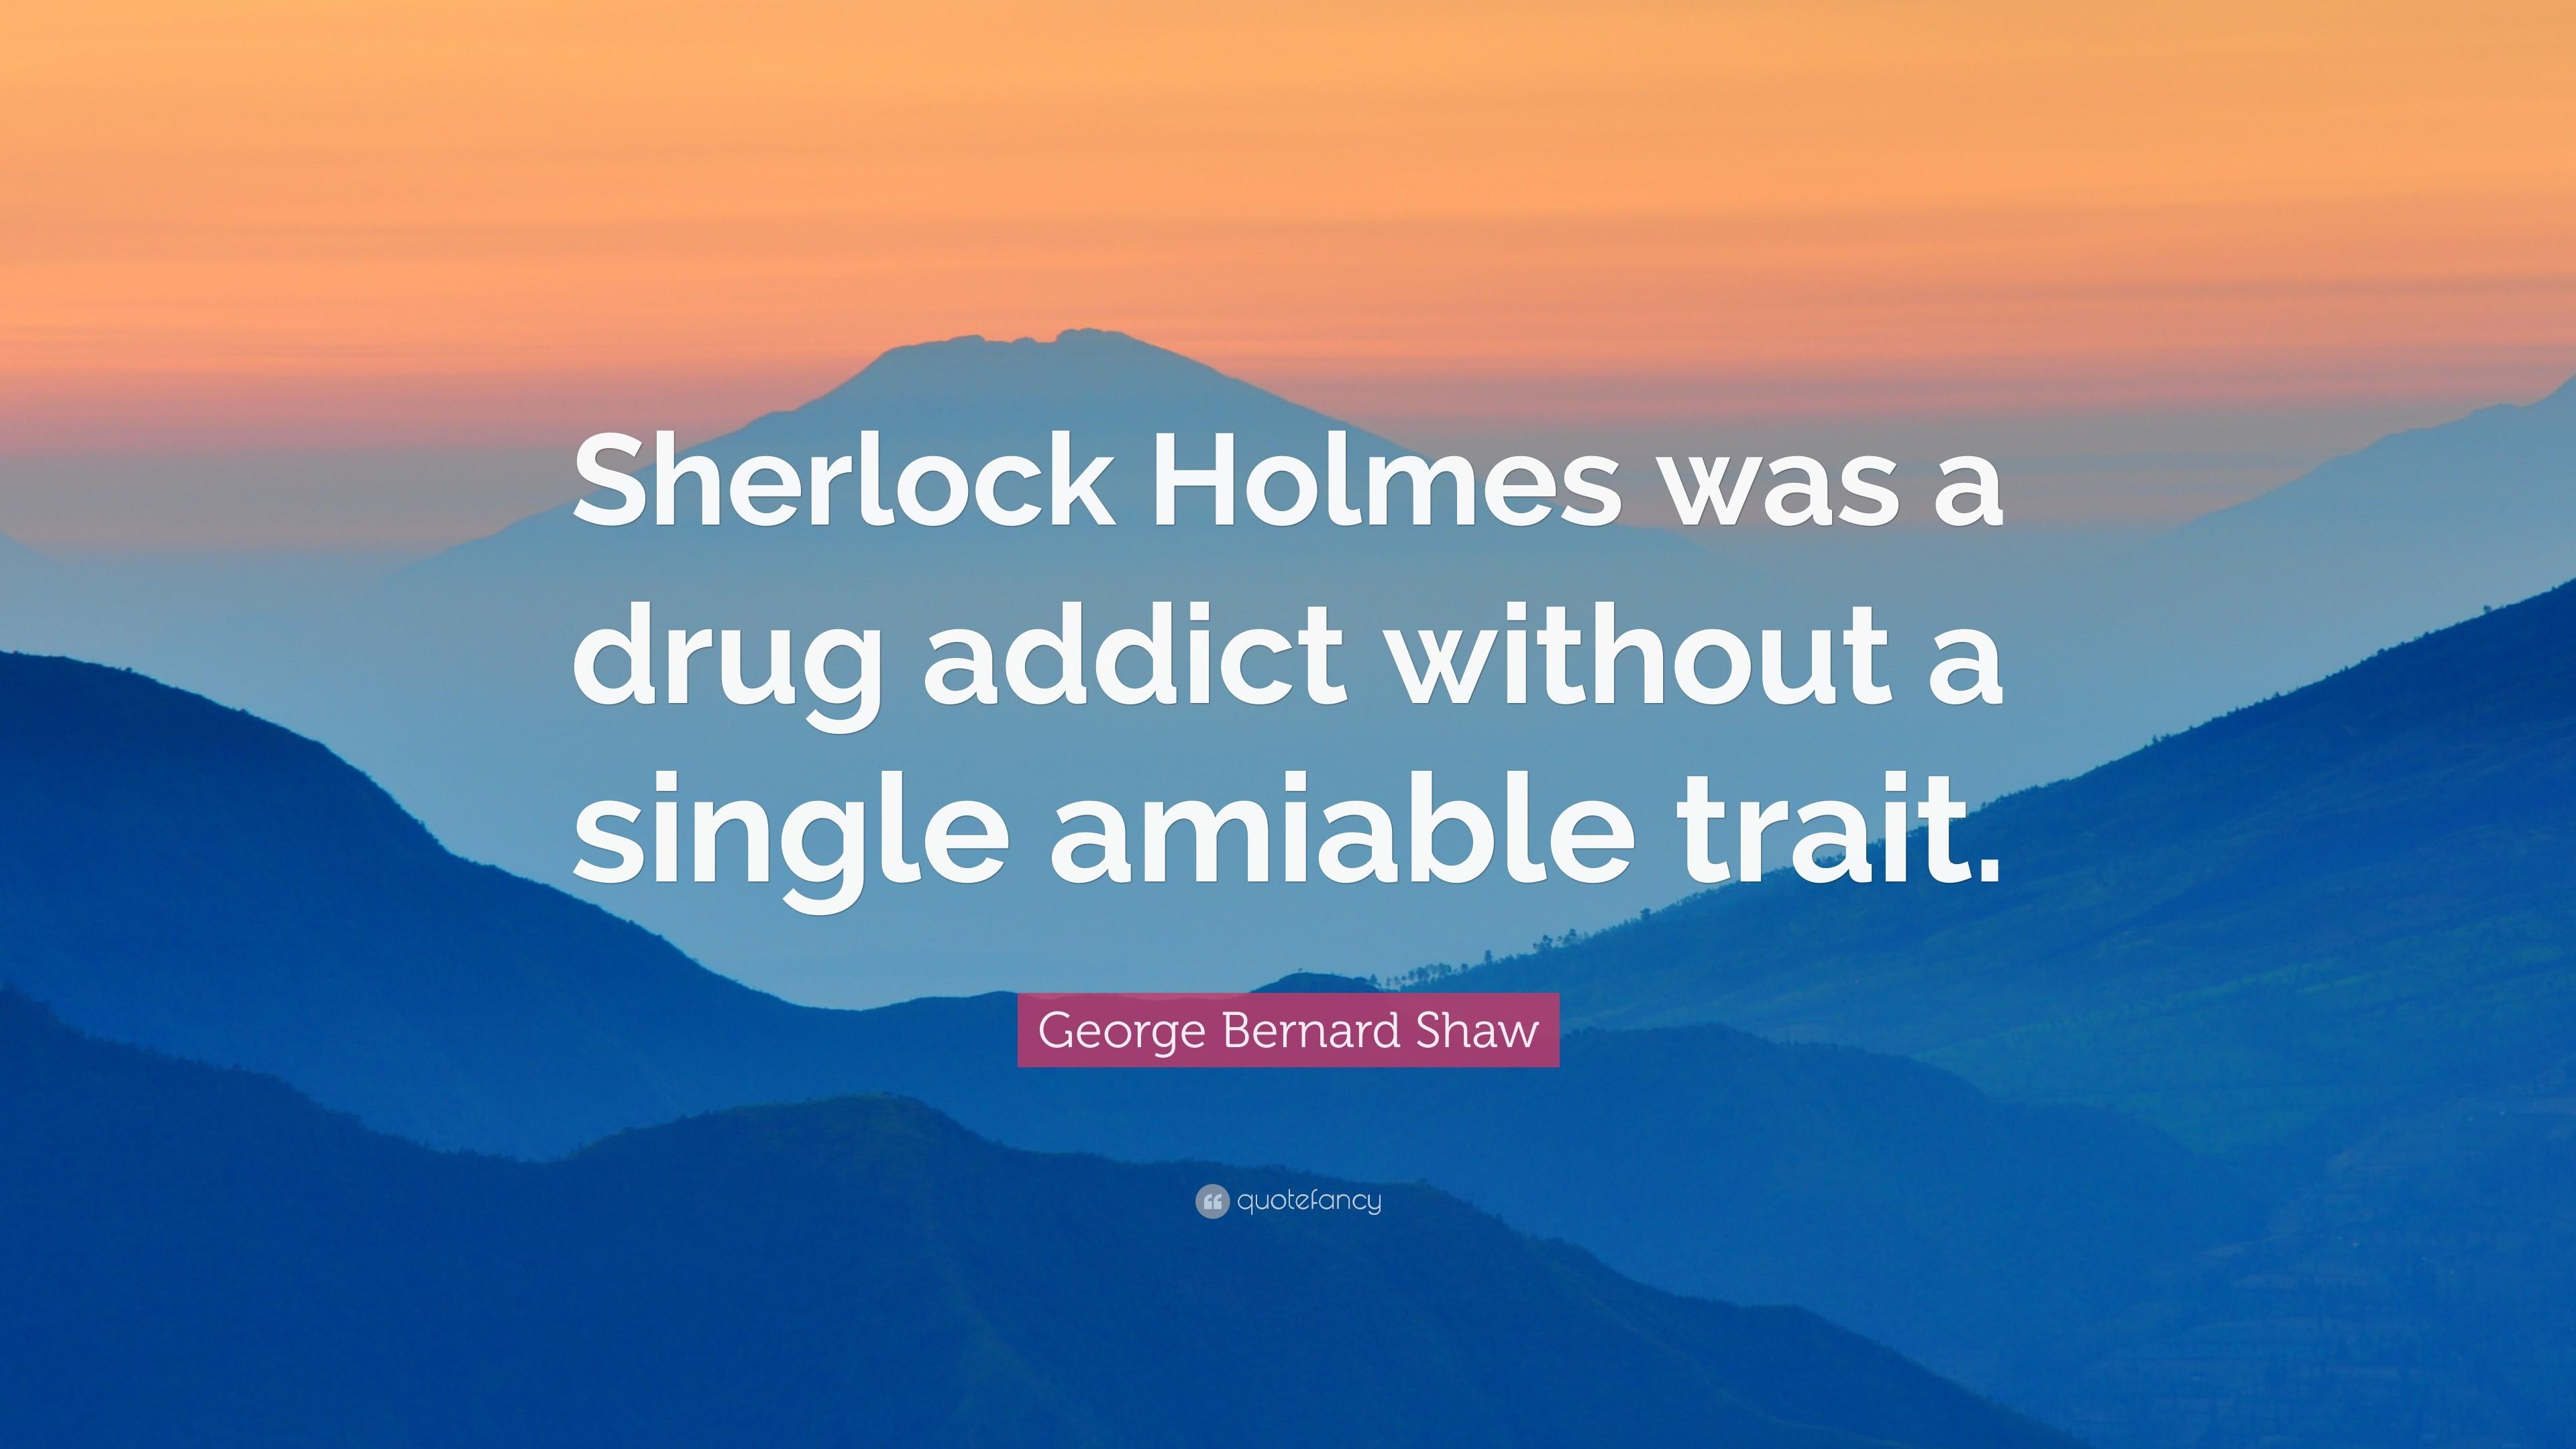 Sherlock Holmes Quotes Wallpaper Sherlock Holmes Quotes Wallpaper 183 ① Wallpapertag